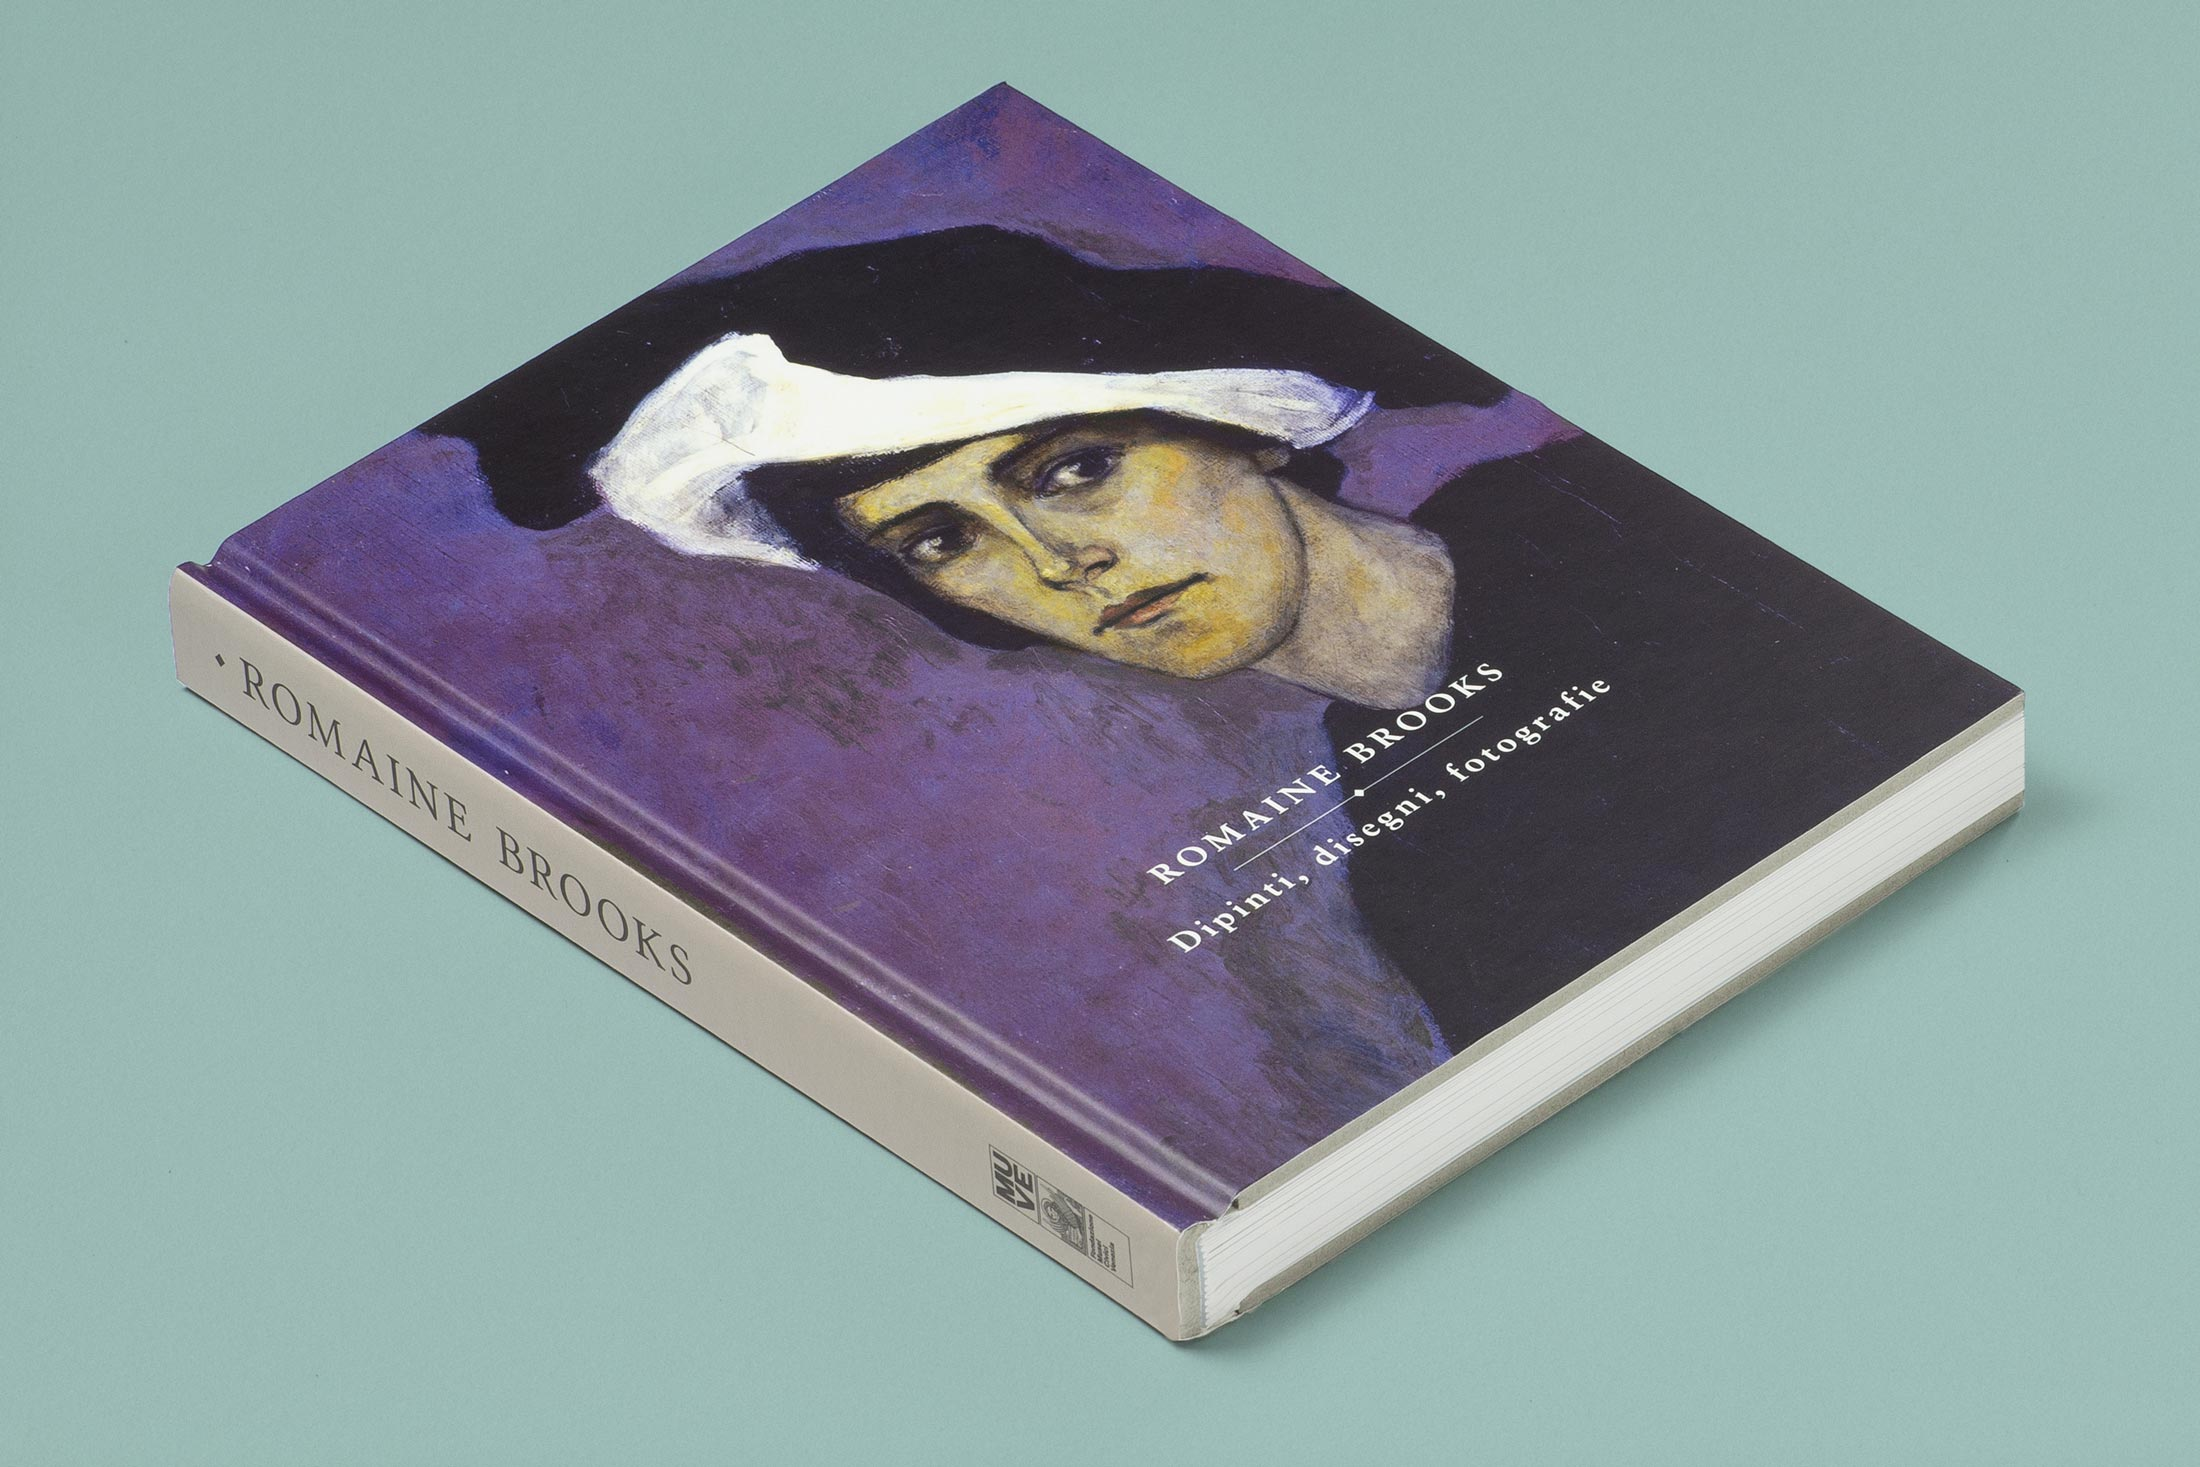 Romaine Brooks - copertina